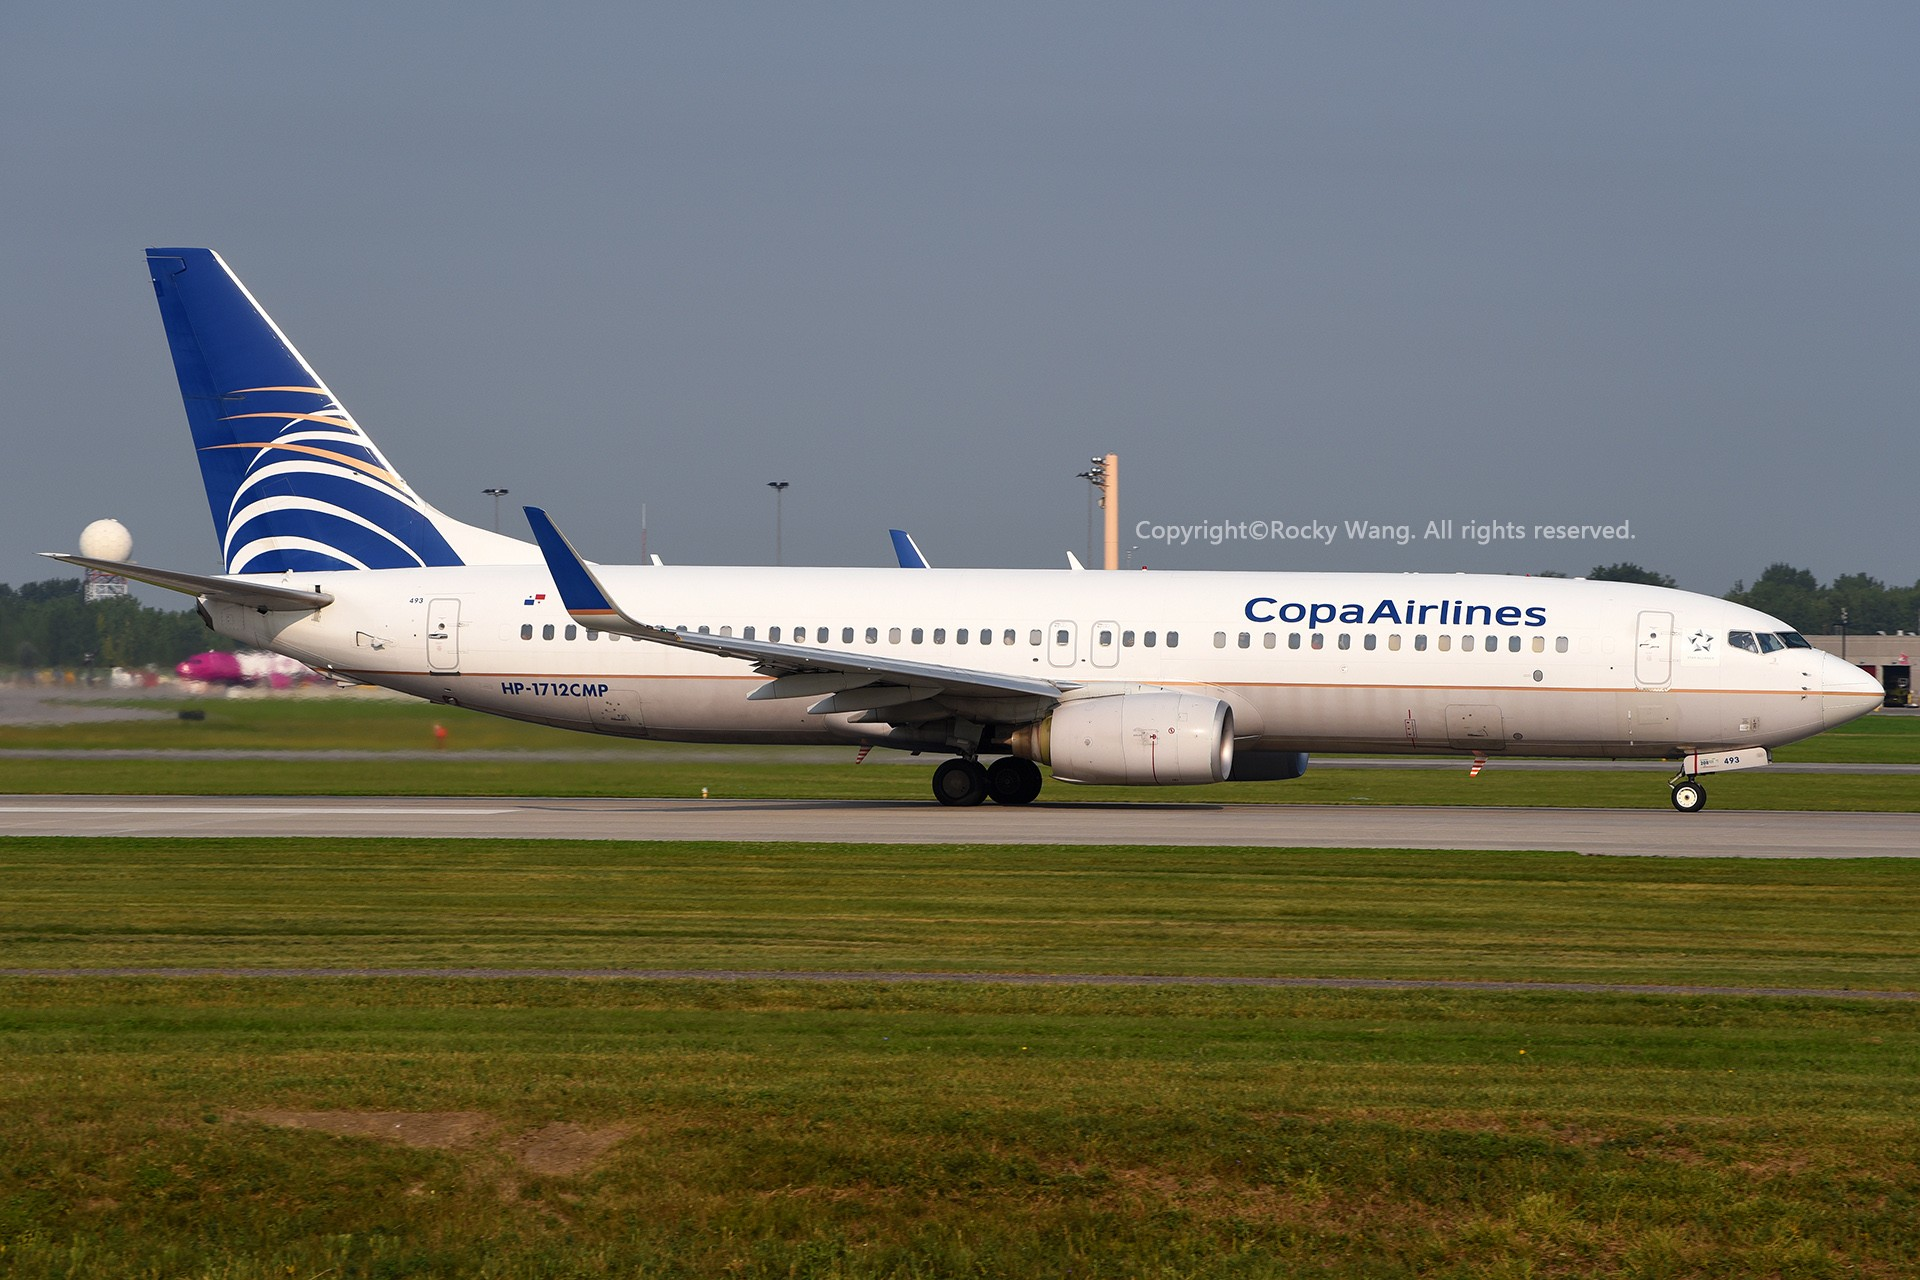 Re:[原创]CYUL 30图 BOEING 737-8V3 HP-1712CMP Montreal Pierre Elliott Trudeau Int'l Ai